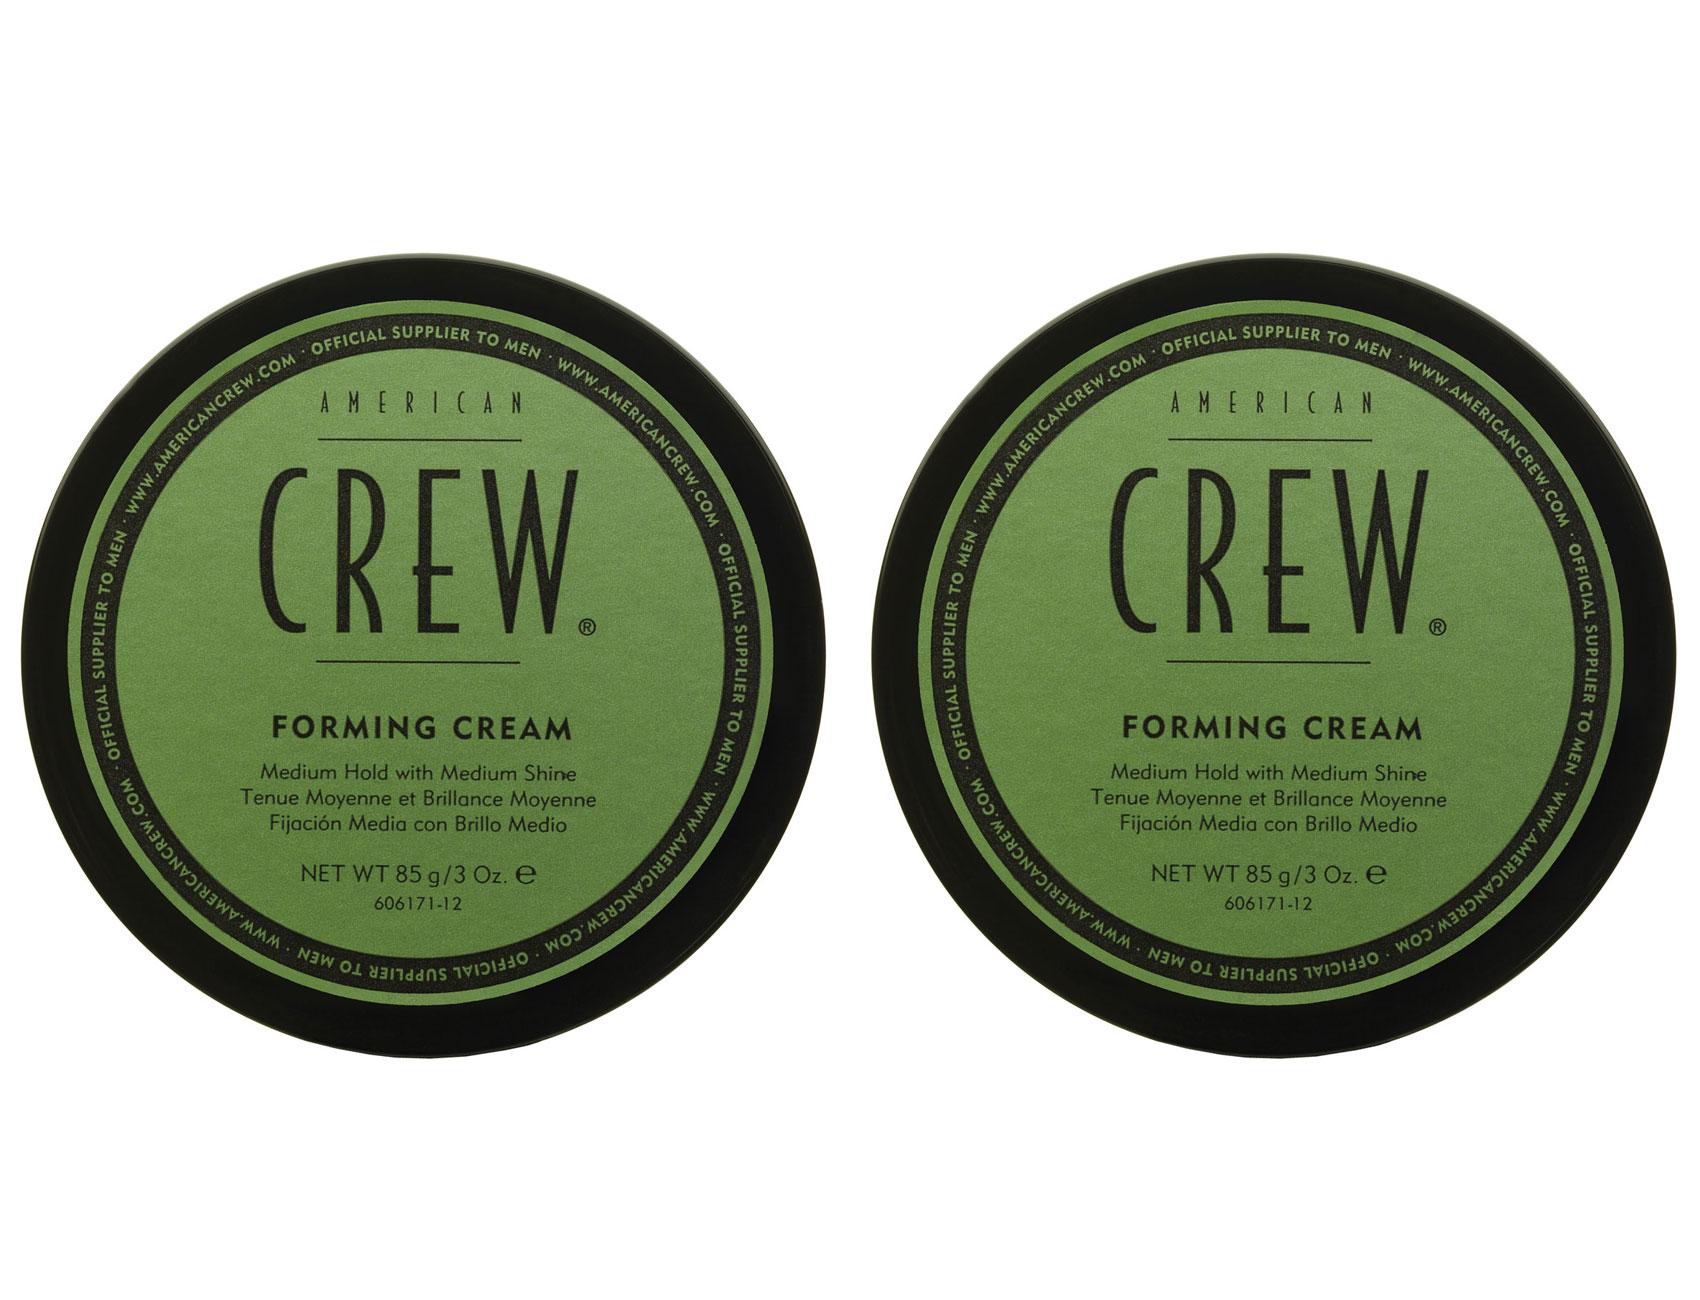 American Crew Forming Cream Aktion 2x 85g = 170g